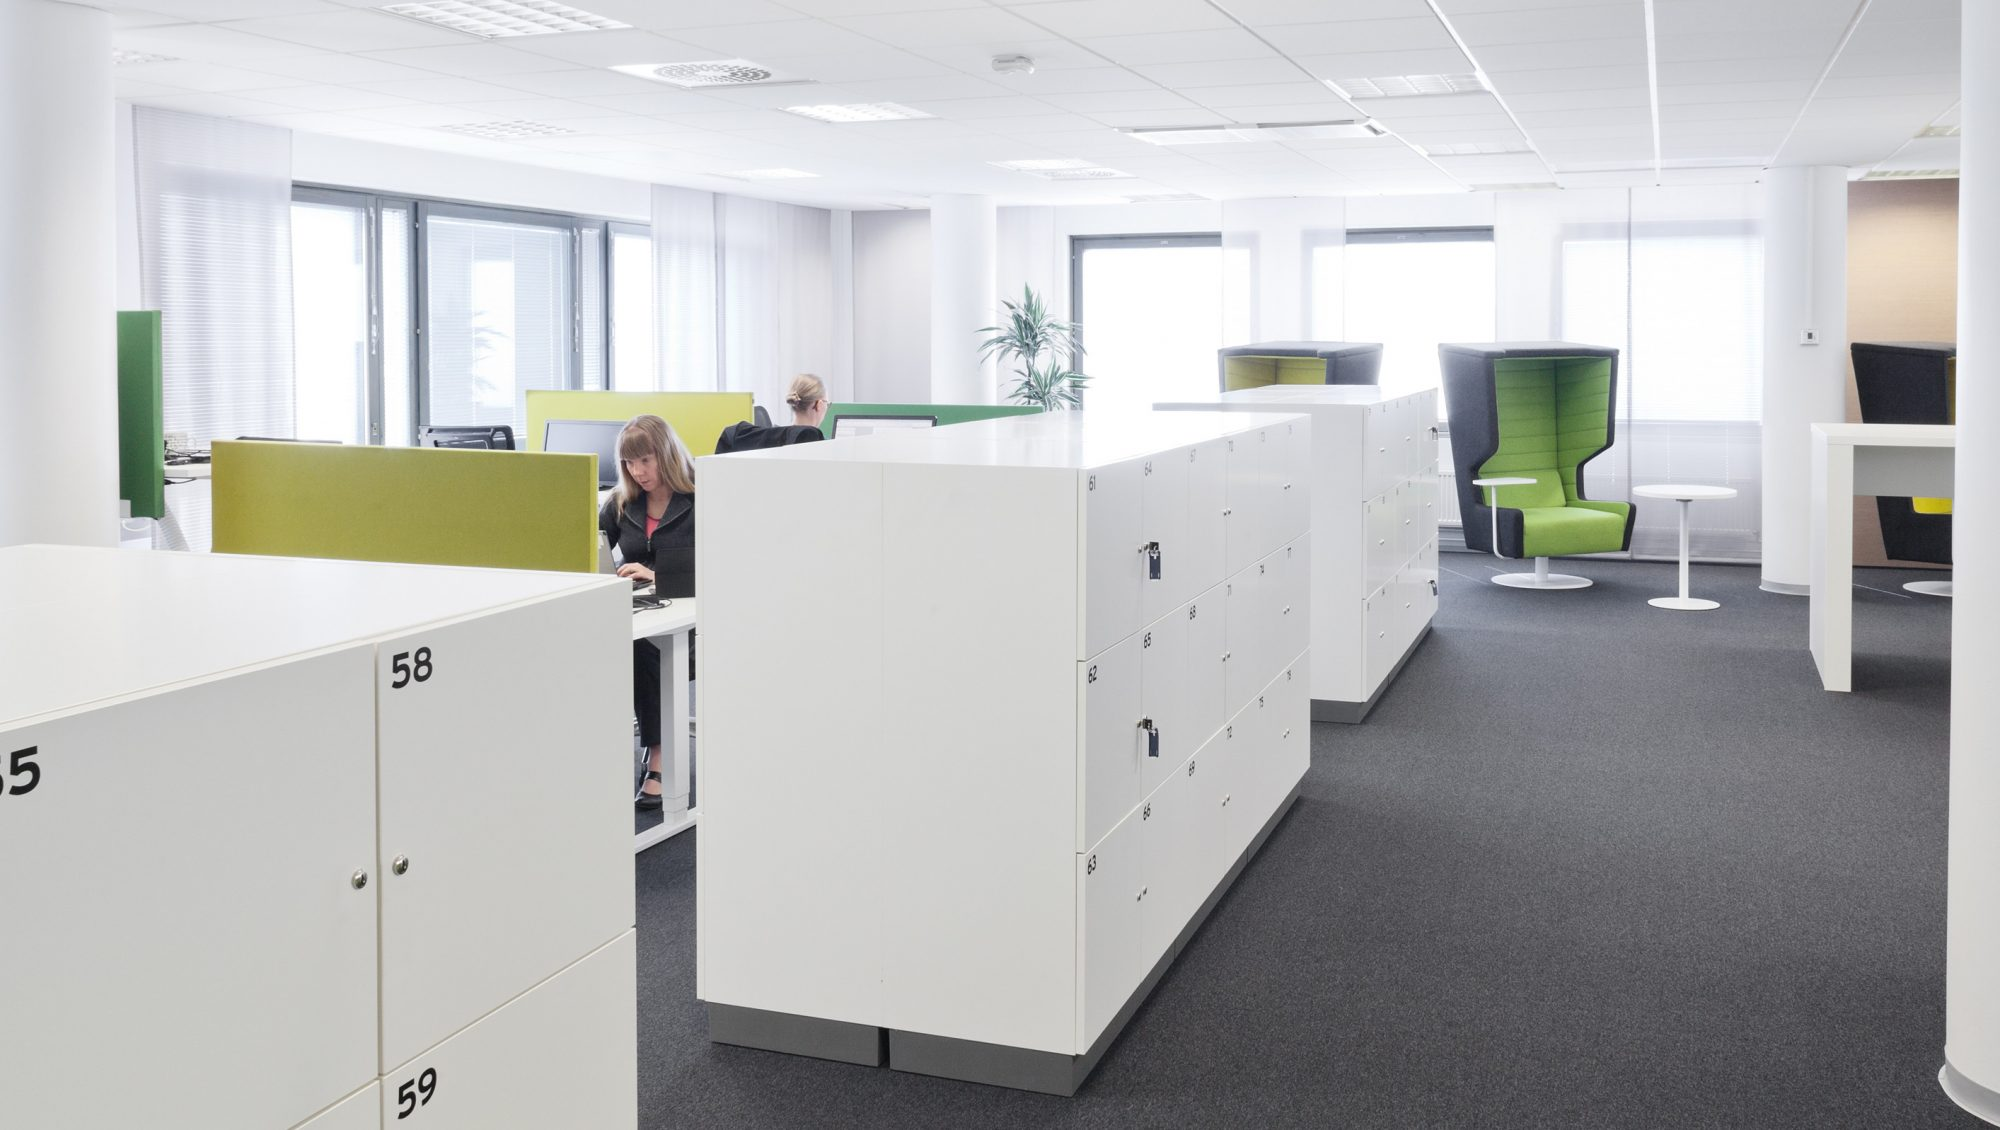 City-of-Espoo-Mayor's-office-GI-Project-1